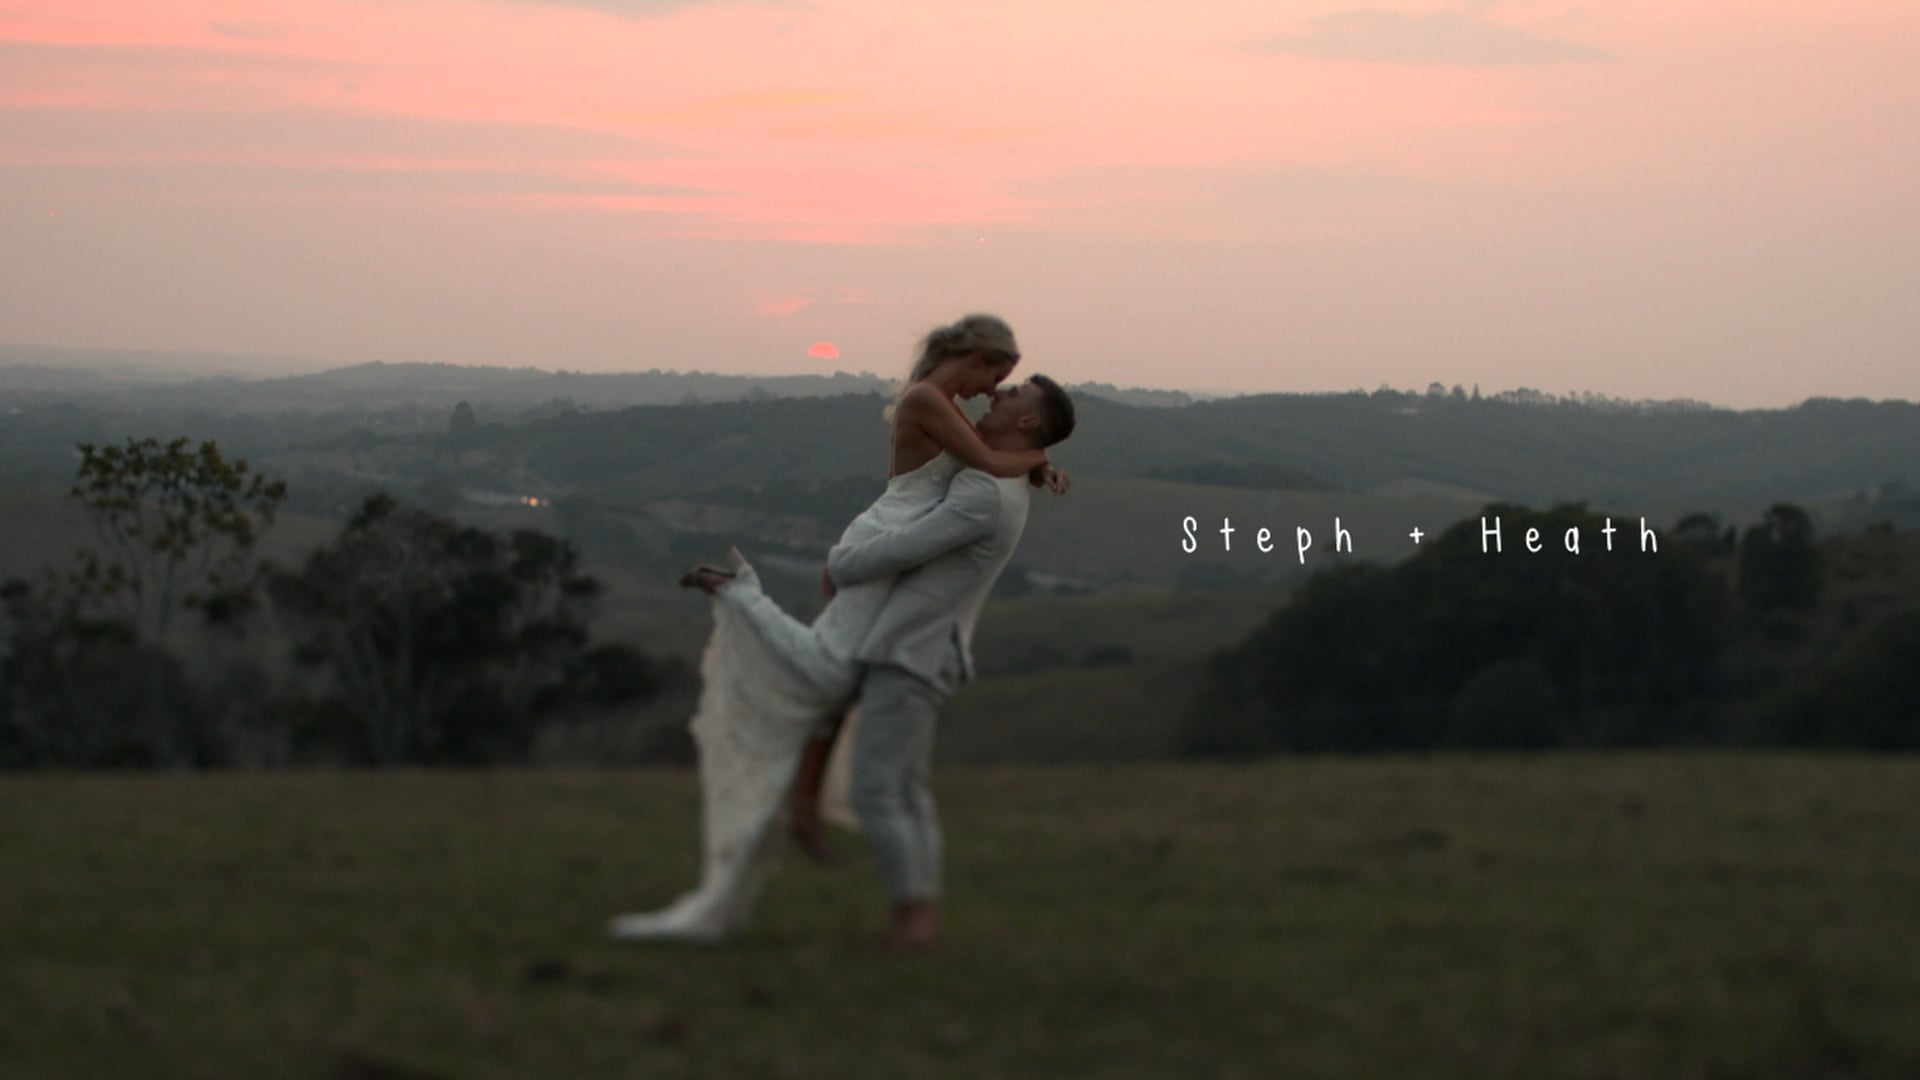 Steph + Heath